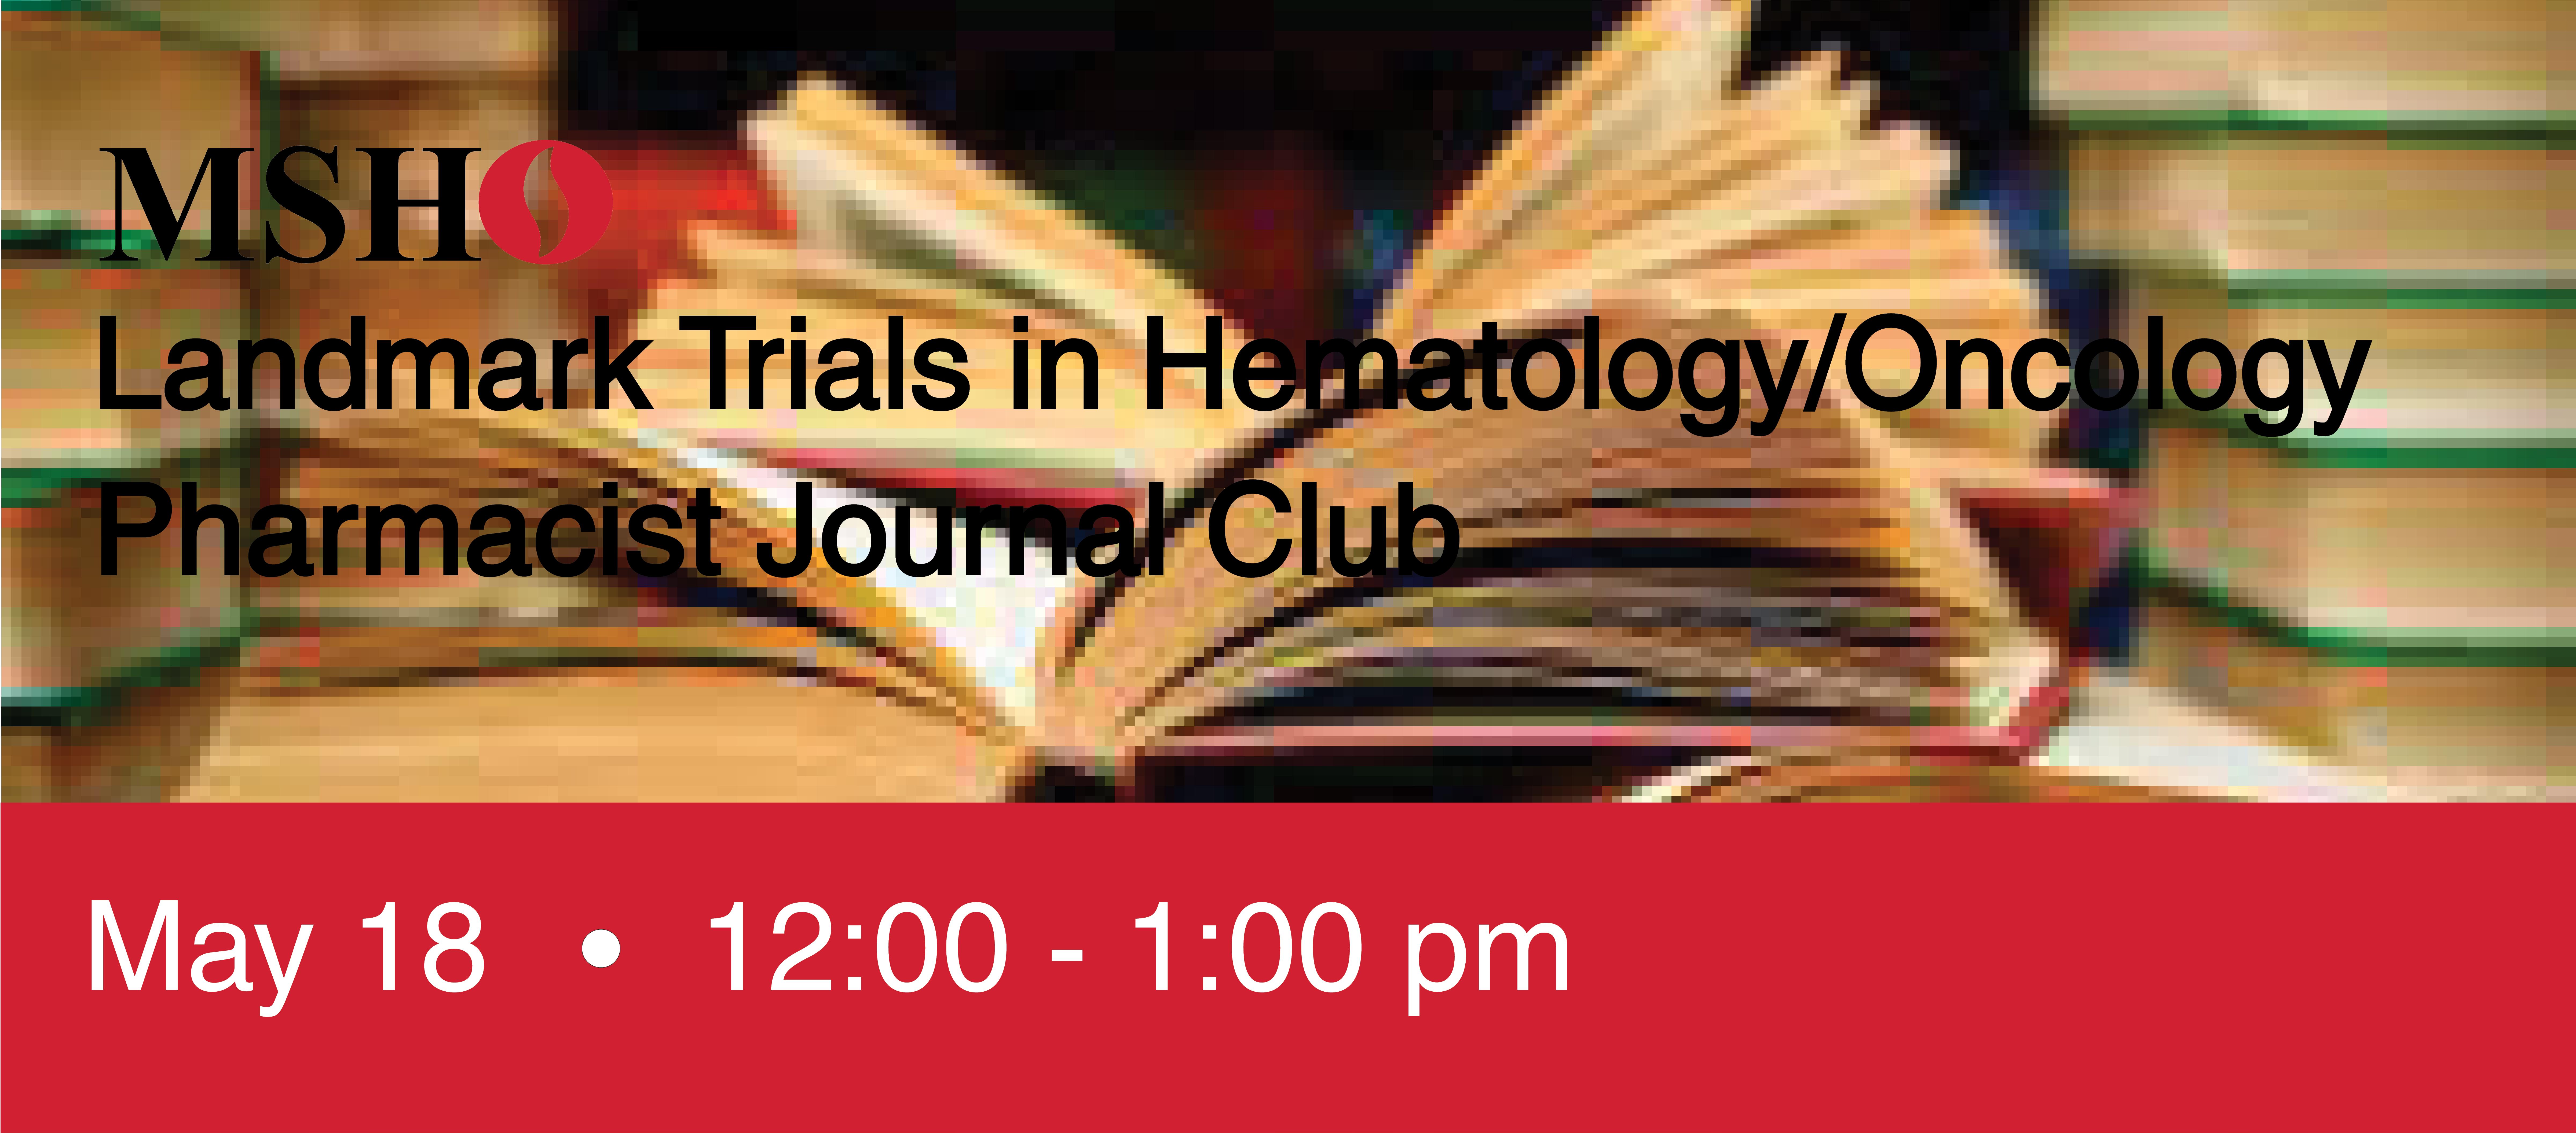 Pharmacist Journal Club